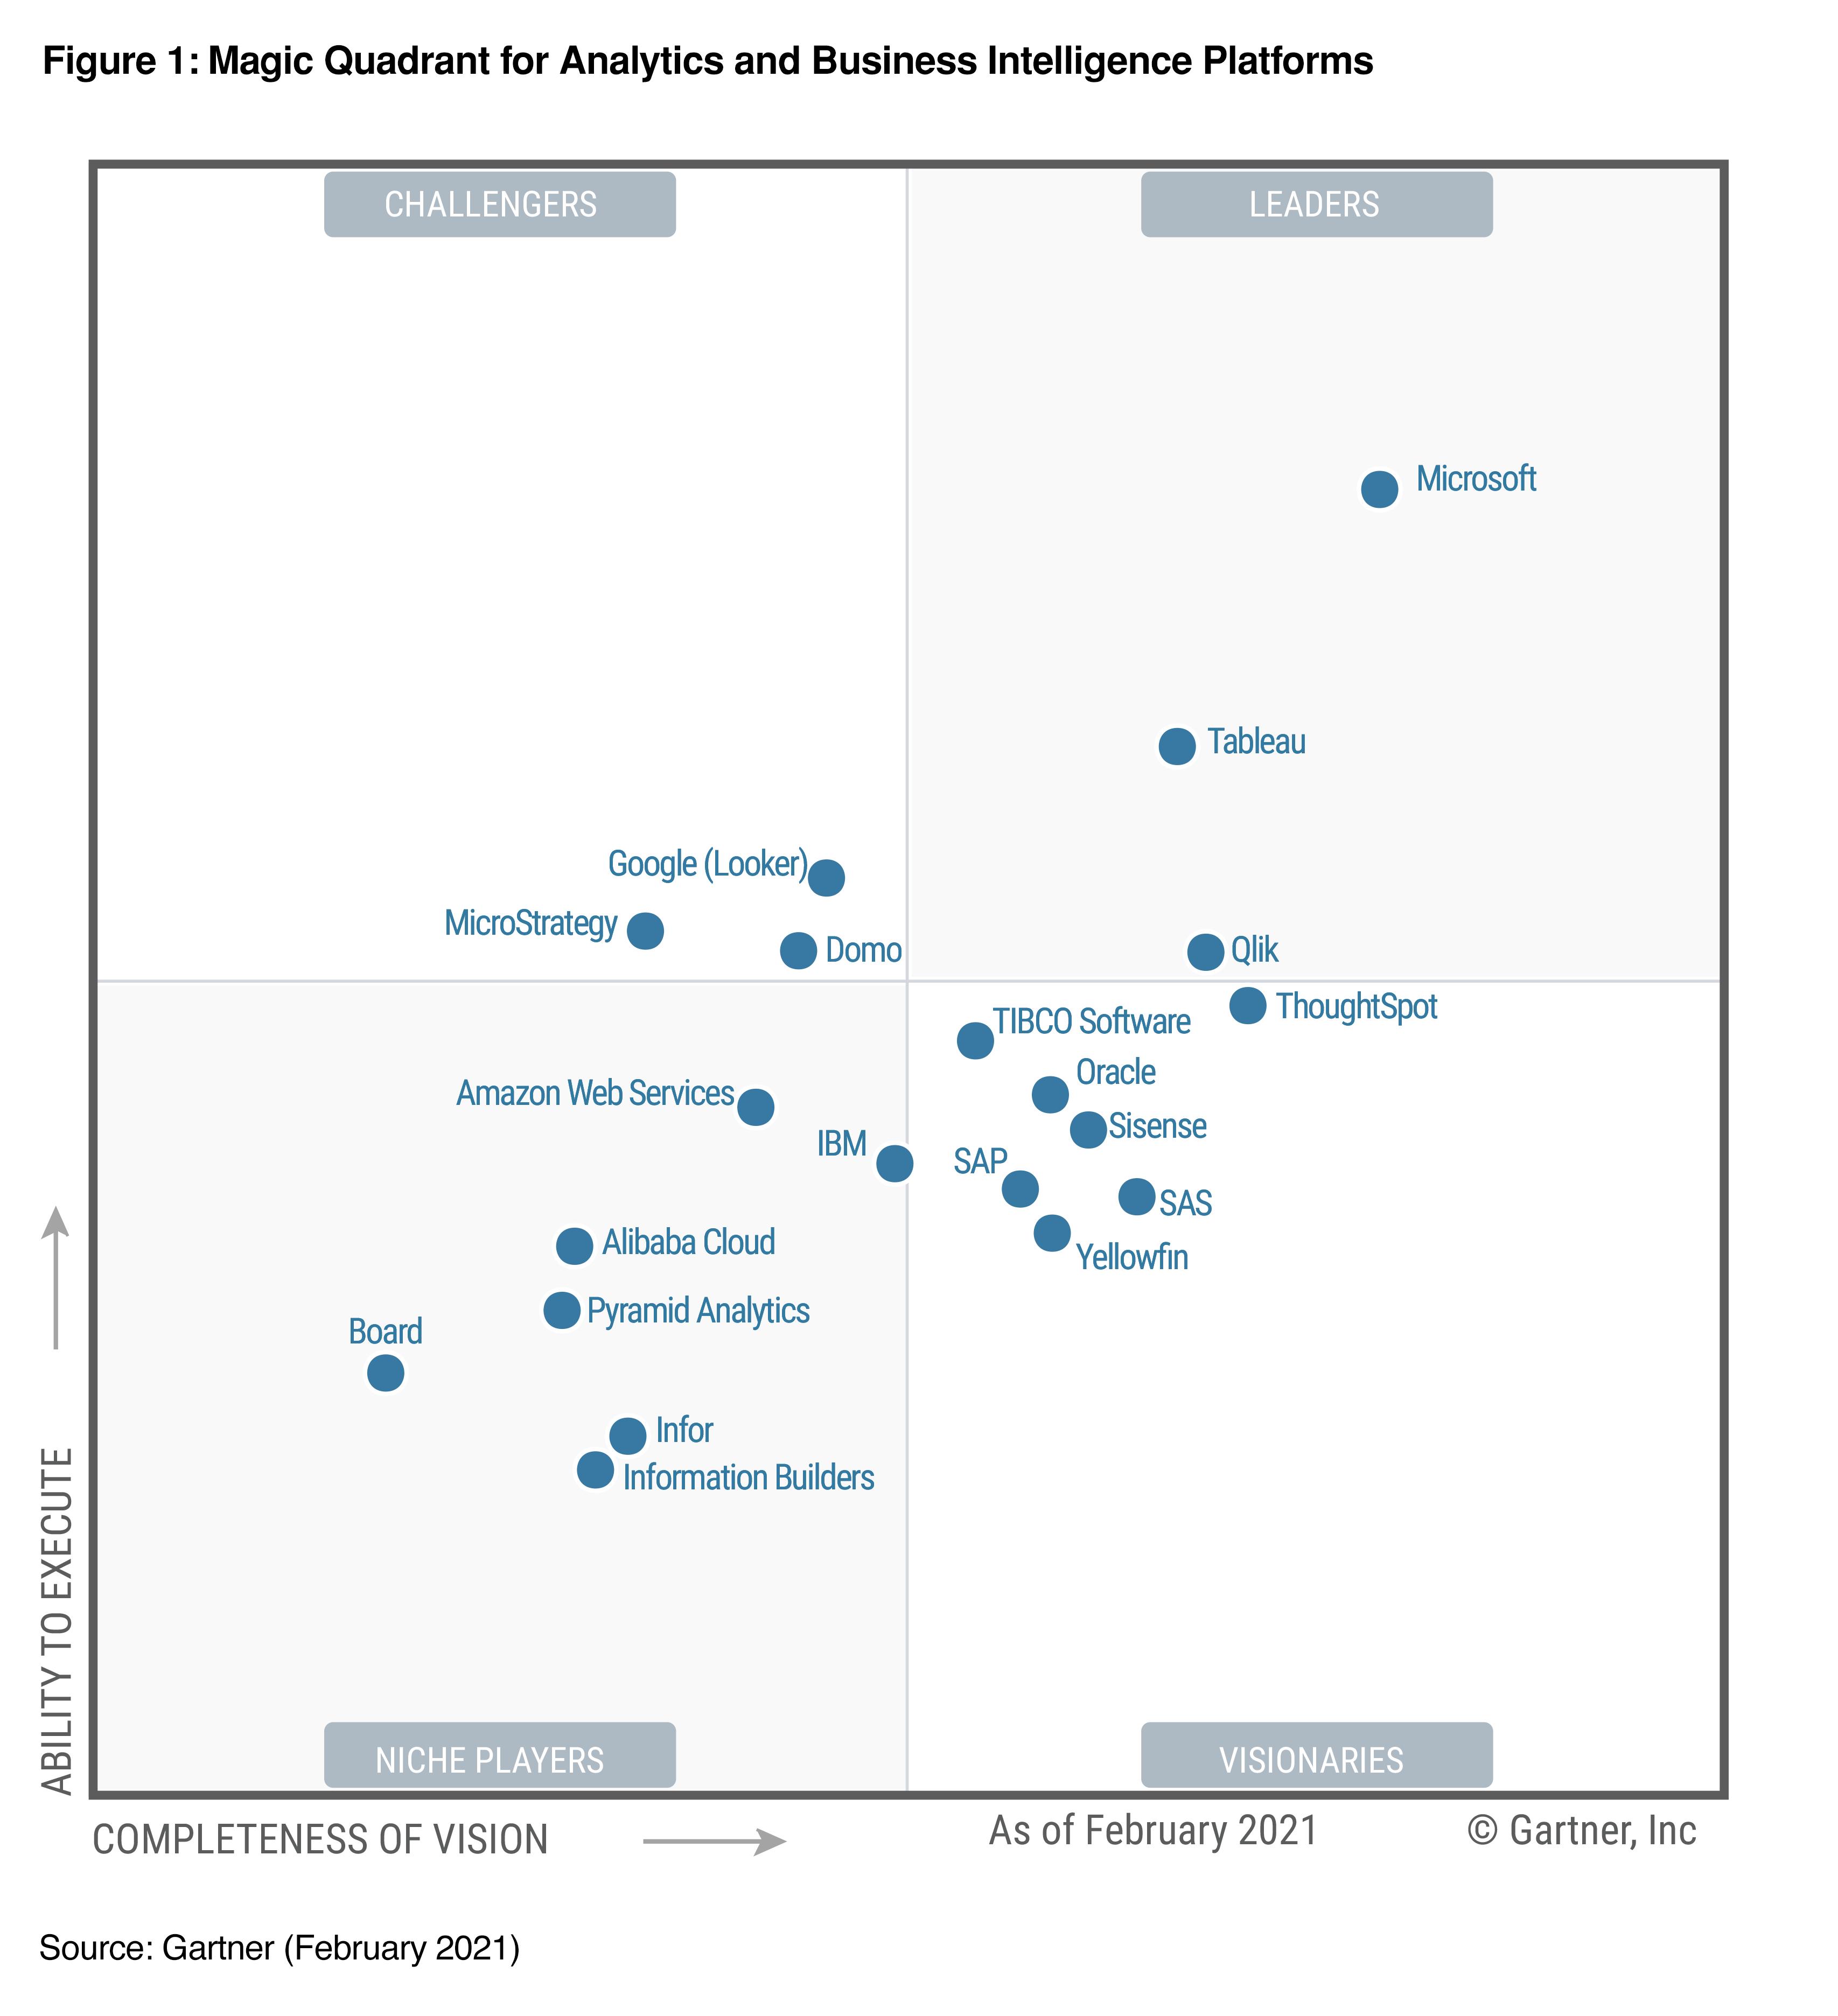 Magic Quadrant for Analytics and BI Platforms